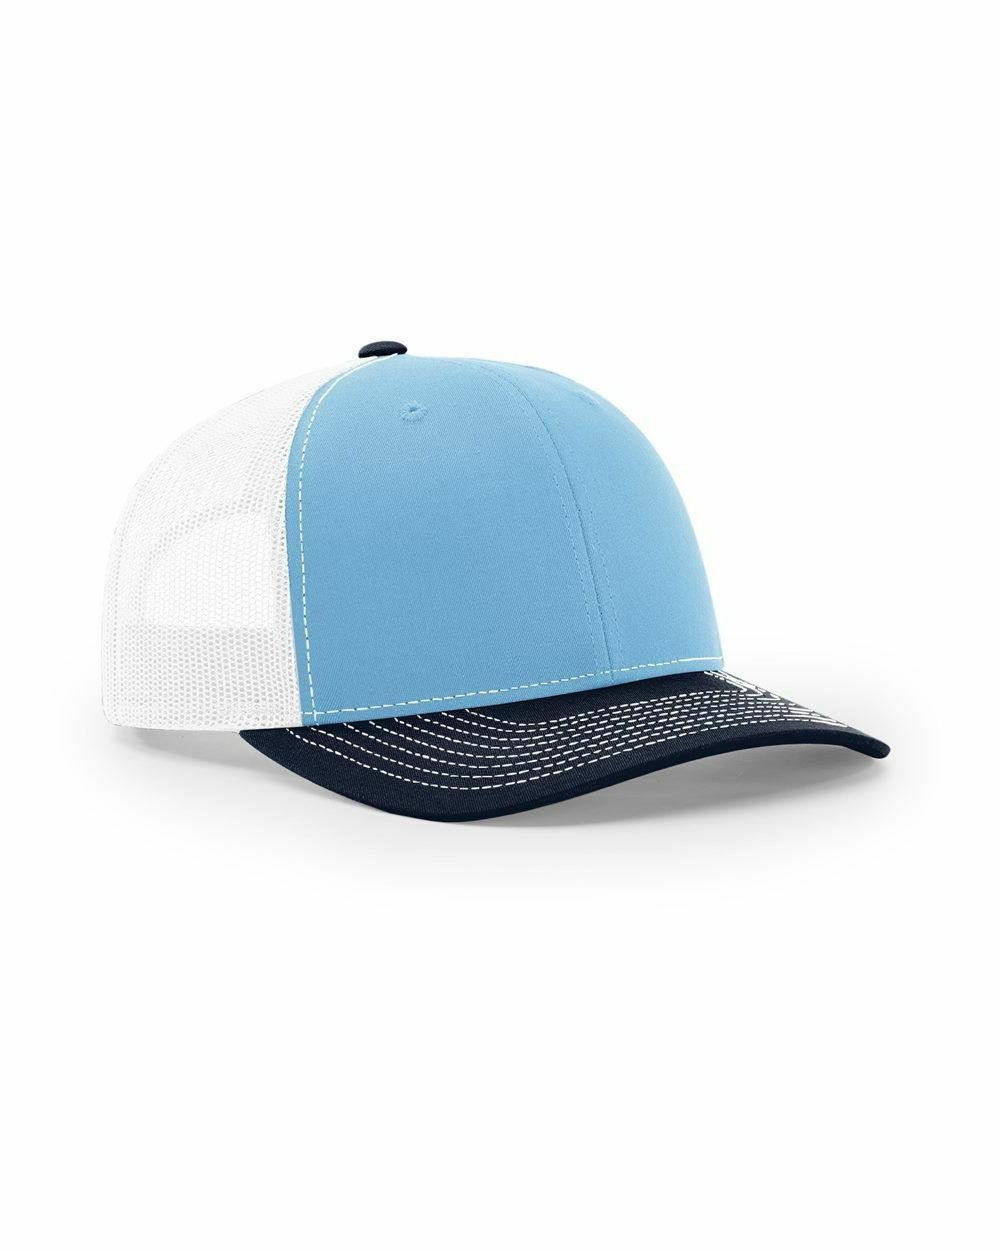 $1.99 Trucker Hat